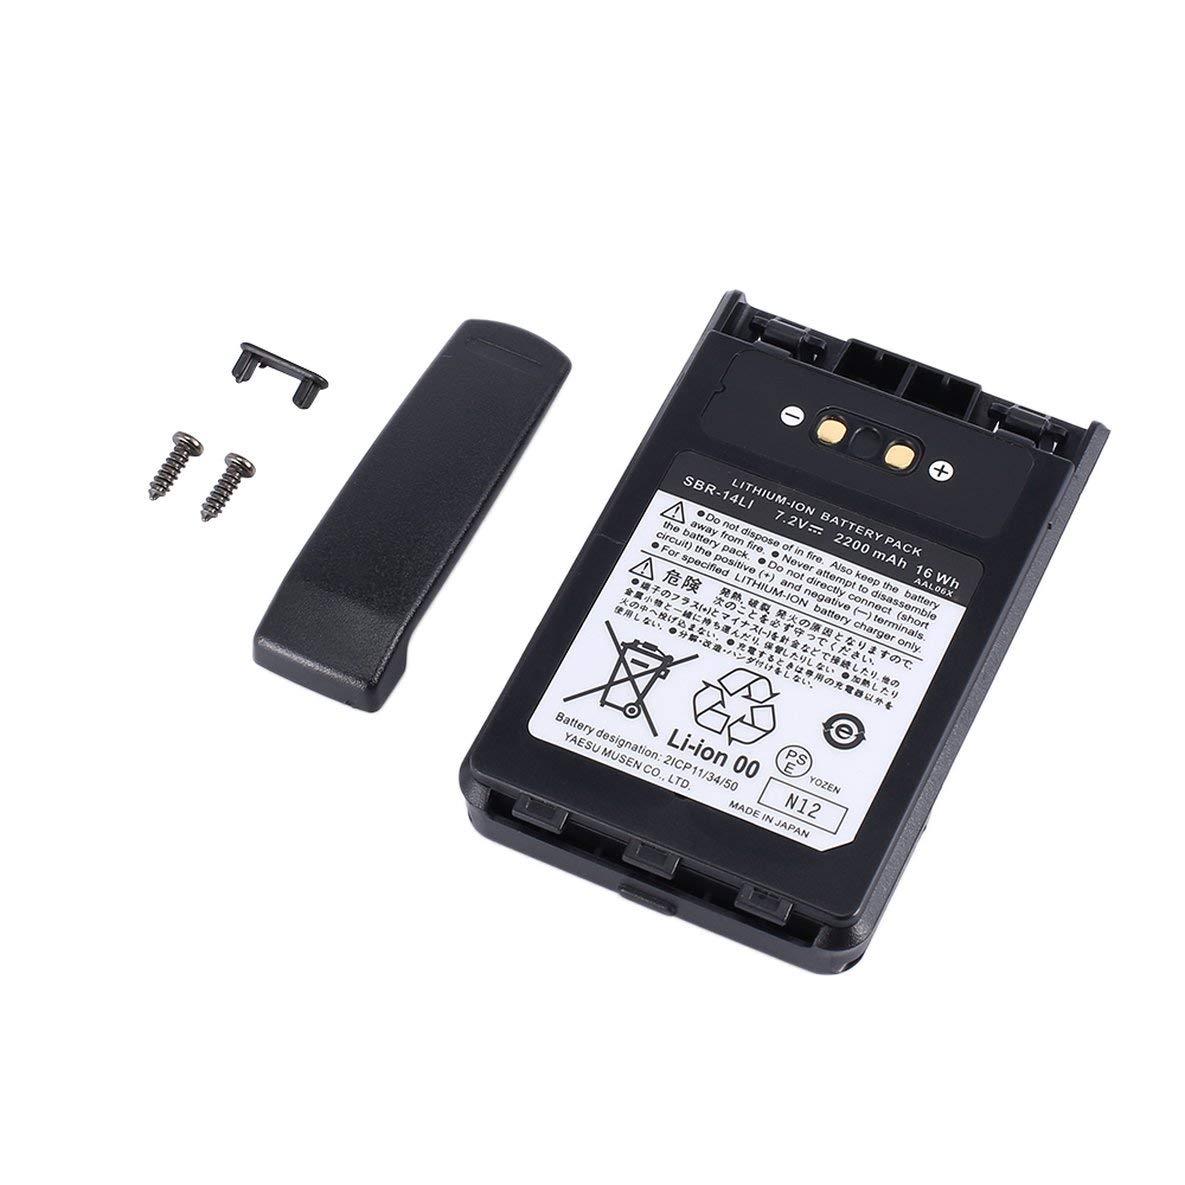 Noradtjcca Batteria Ricaricabile agli ioni di Litio da 2200 mAh per Radio Yaesu VX-8R VX-8DR VX-8GR FT-1DR FT1XD FT-2DR FNB-102LI FNB-101Li